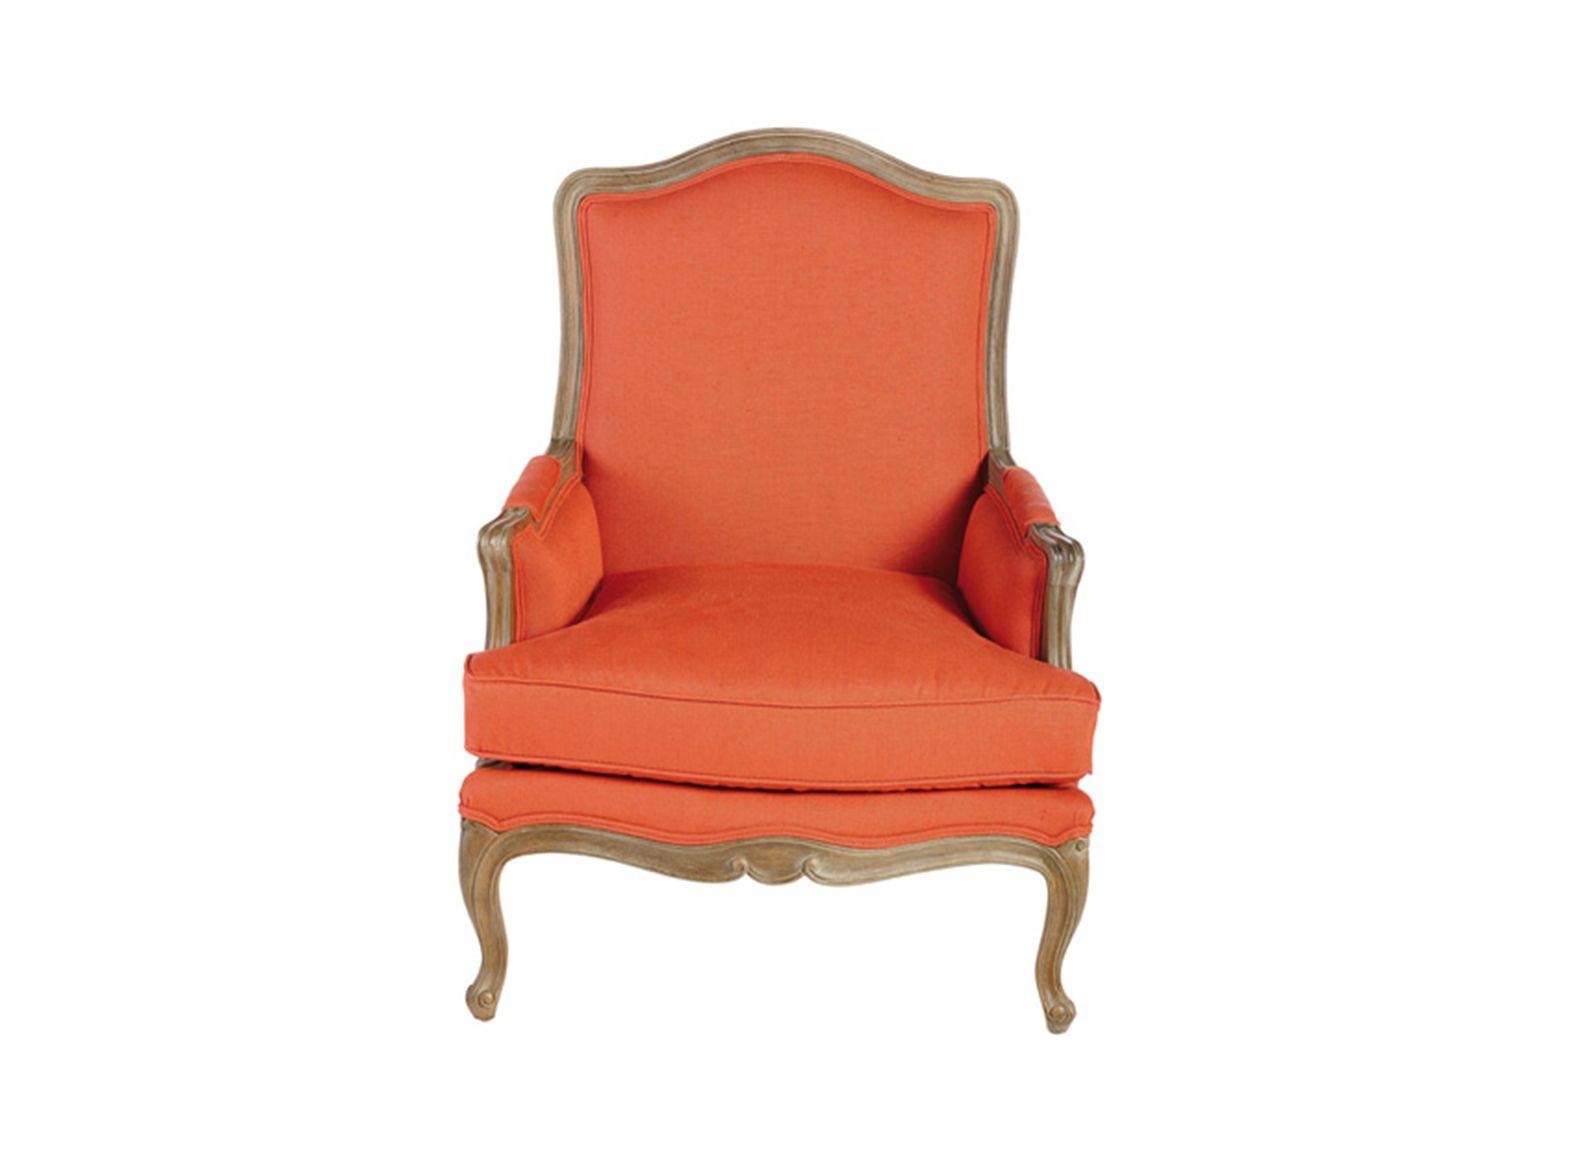 fauteuil signature berg re louis xv. Black Bedroom Furniture Sets. Home Design Ideas